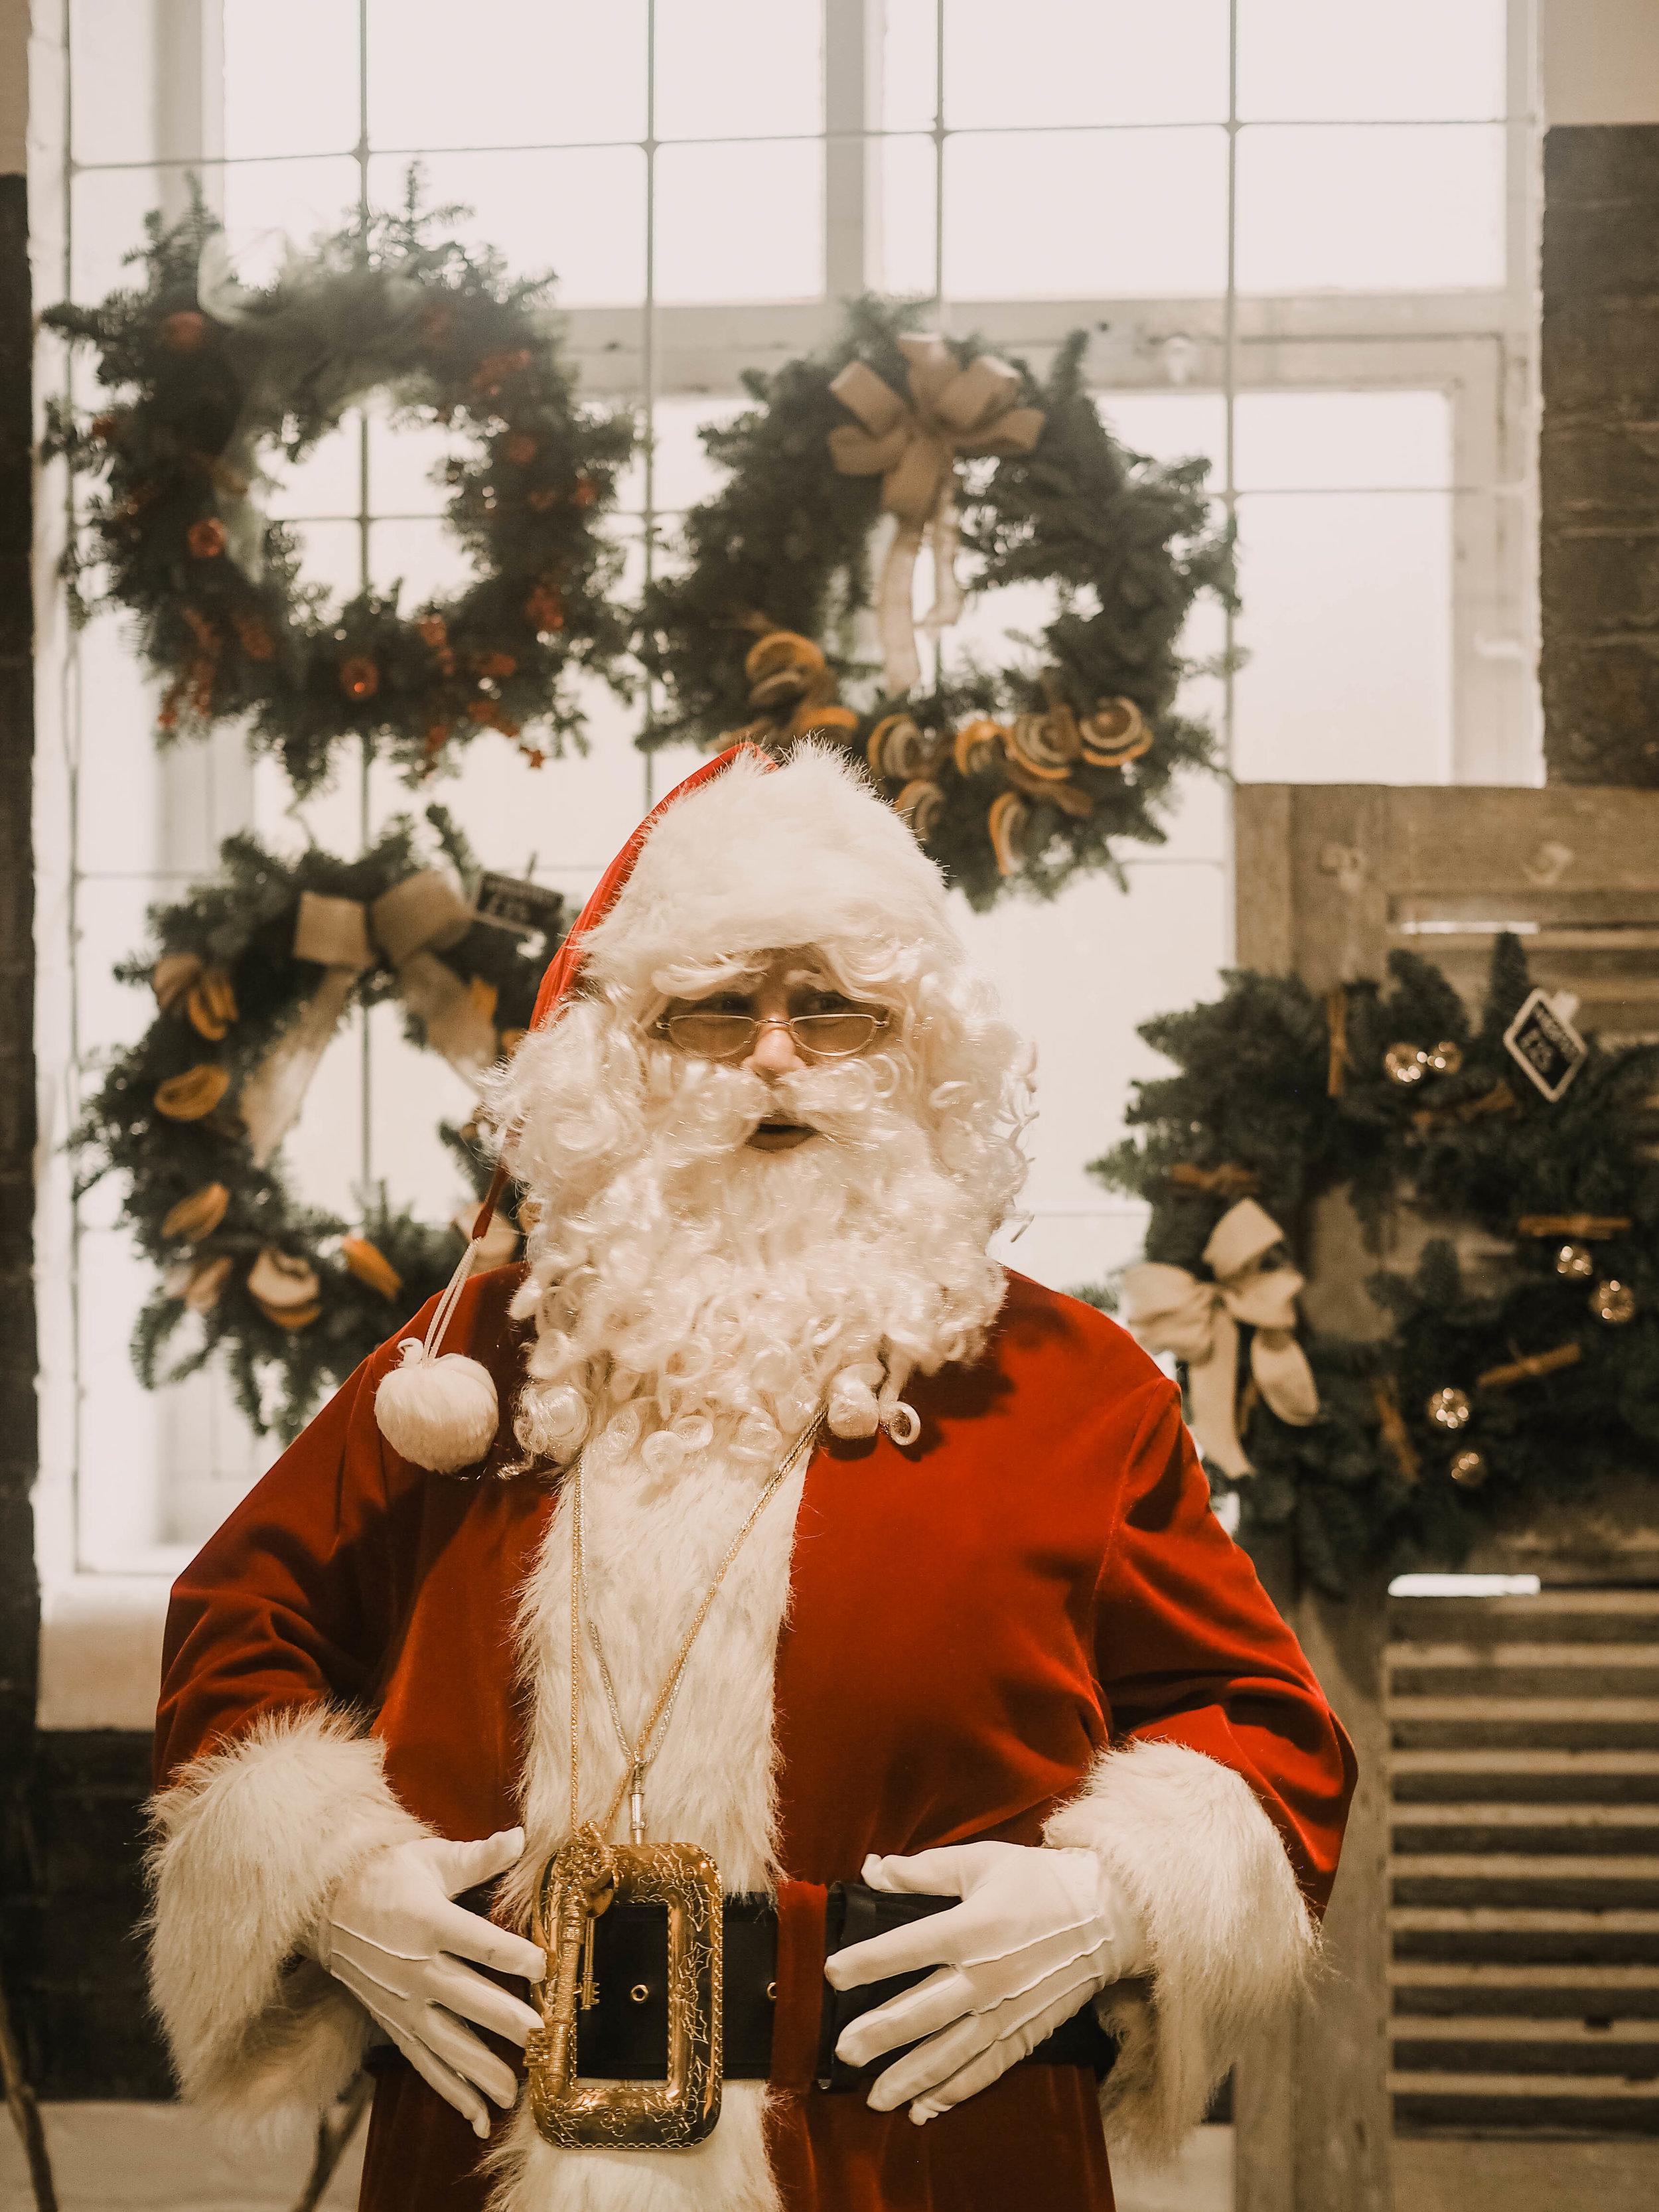 chrismas market derby with santa